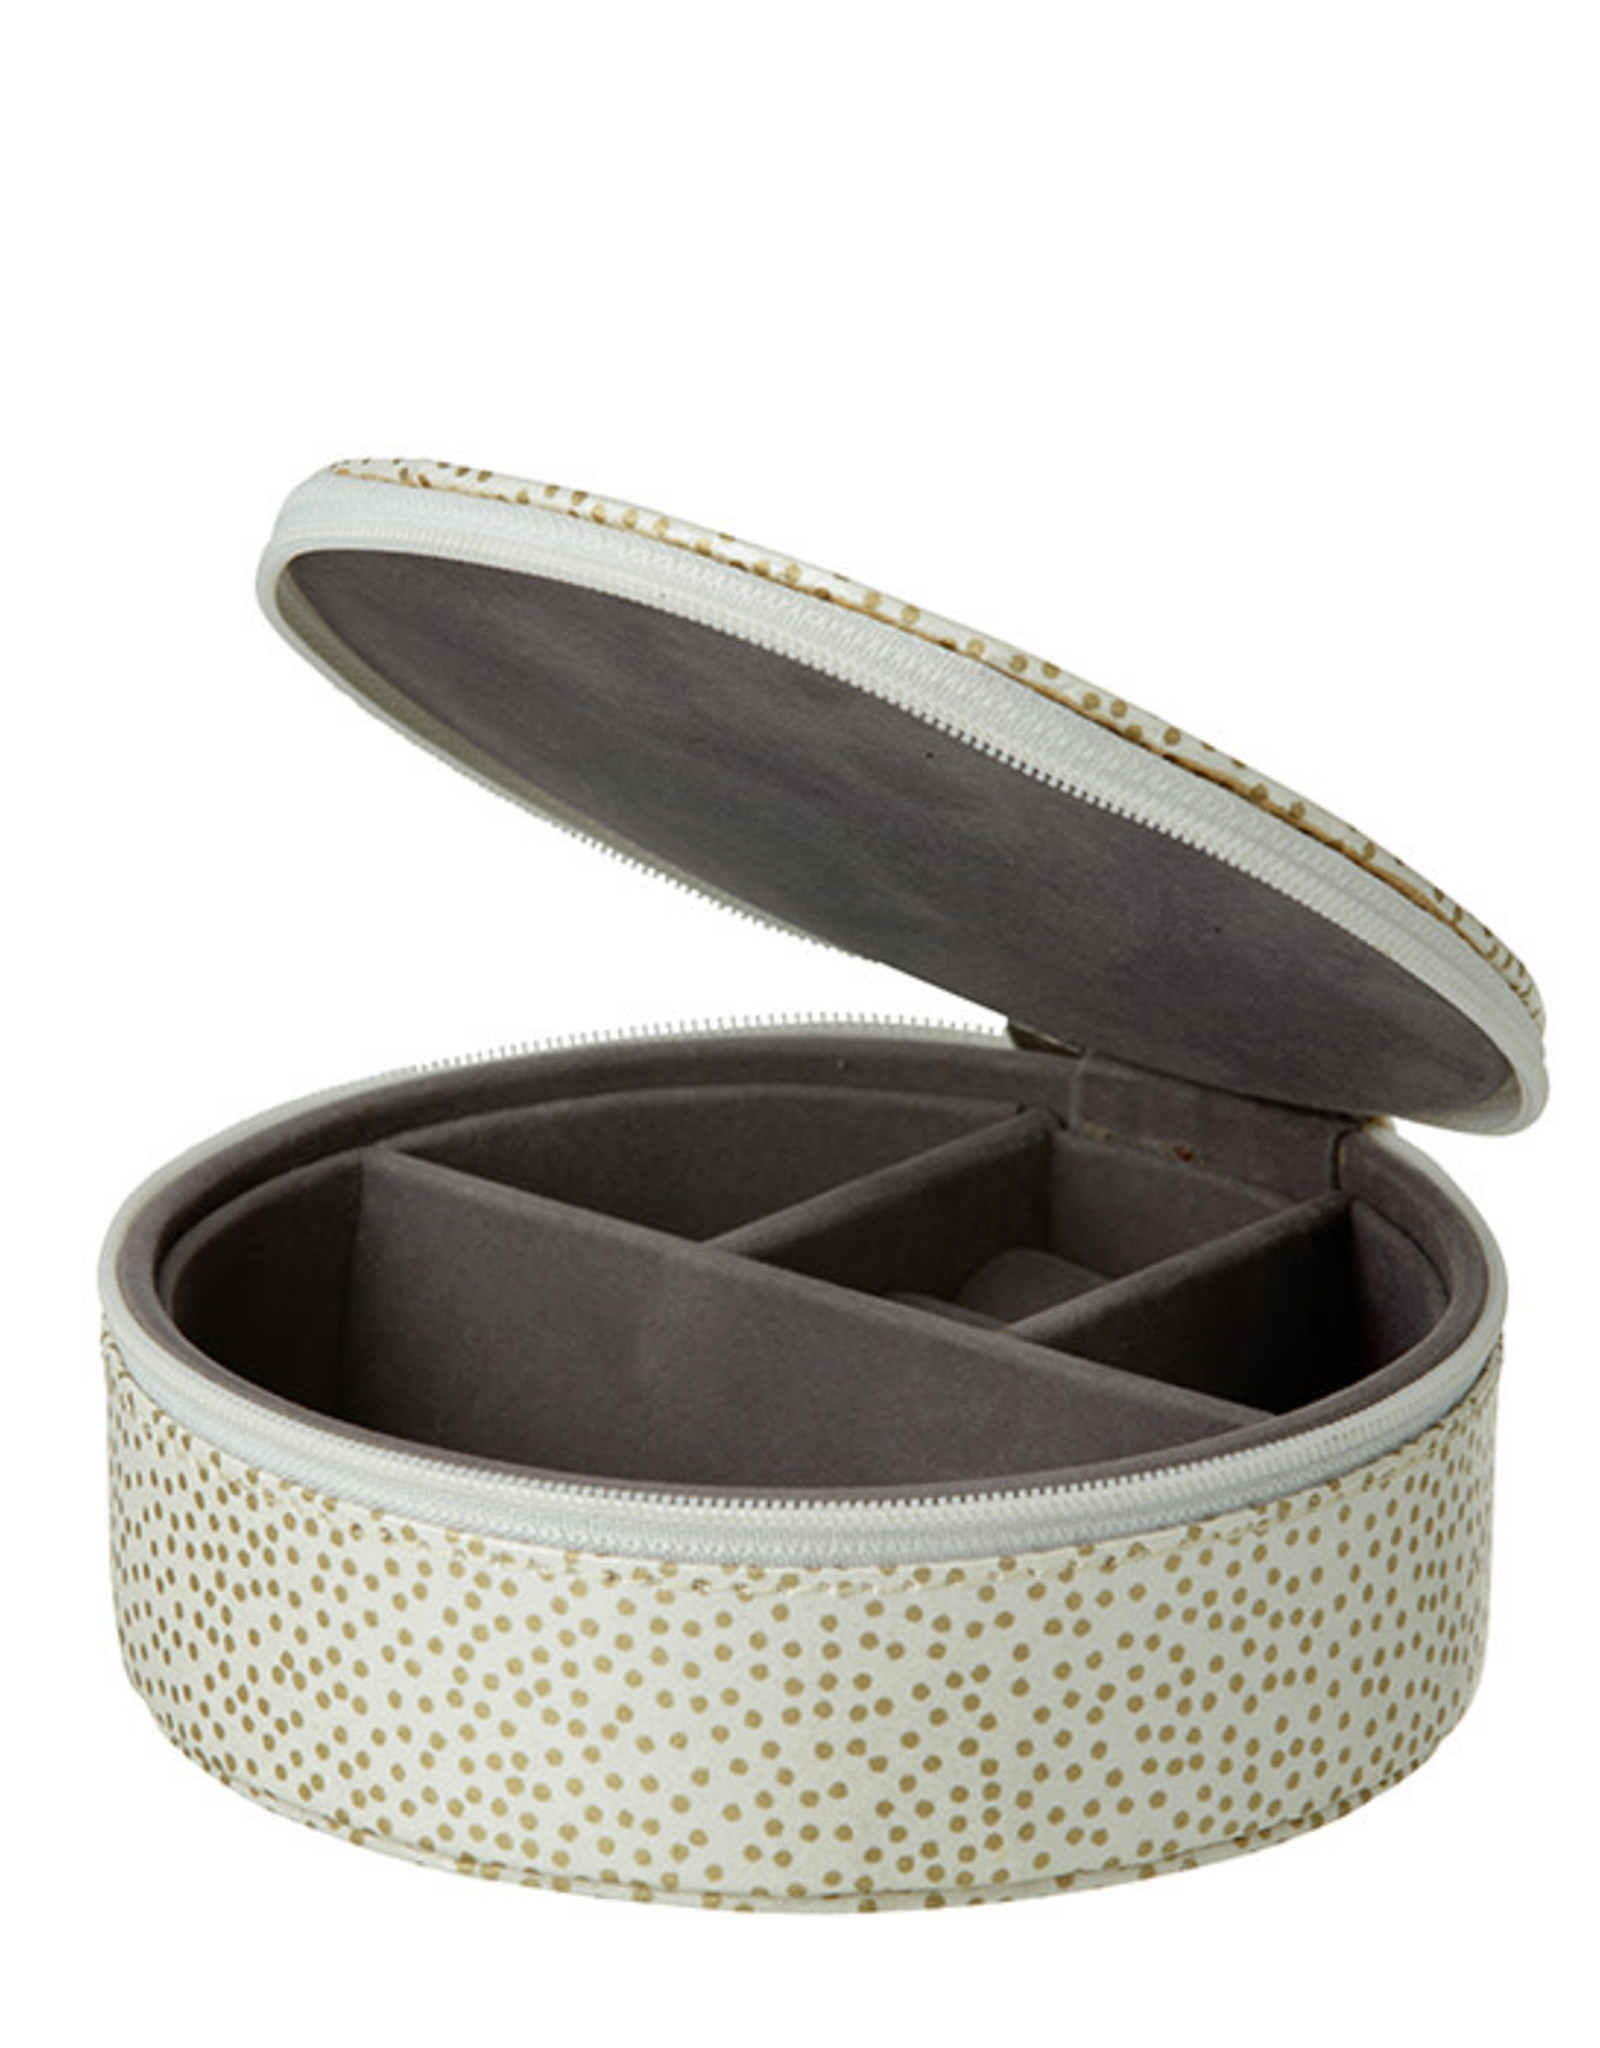 Bungalow Jewellery Box Travel